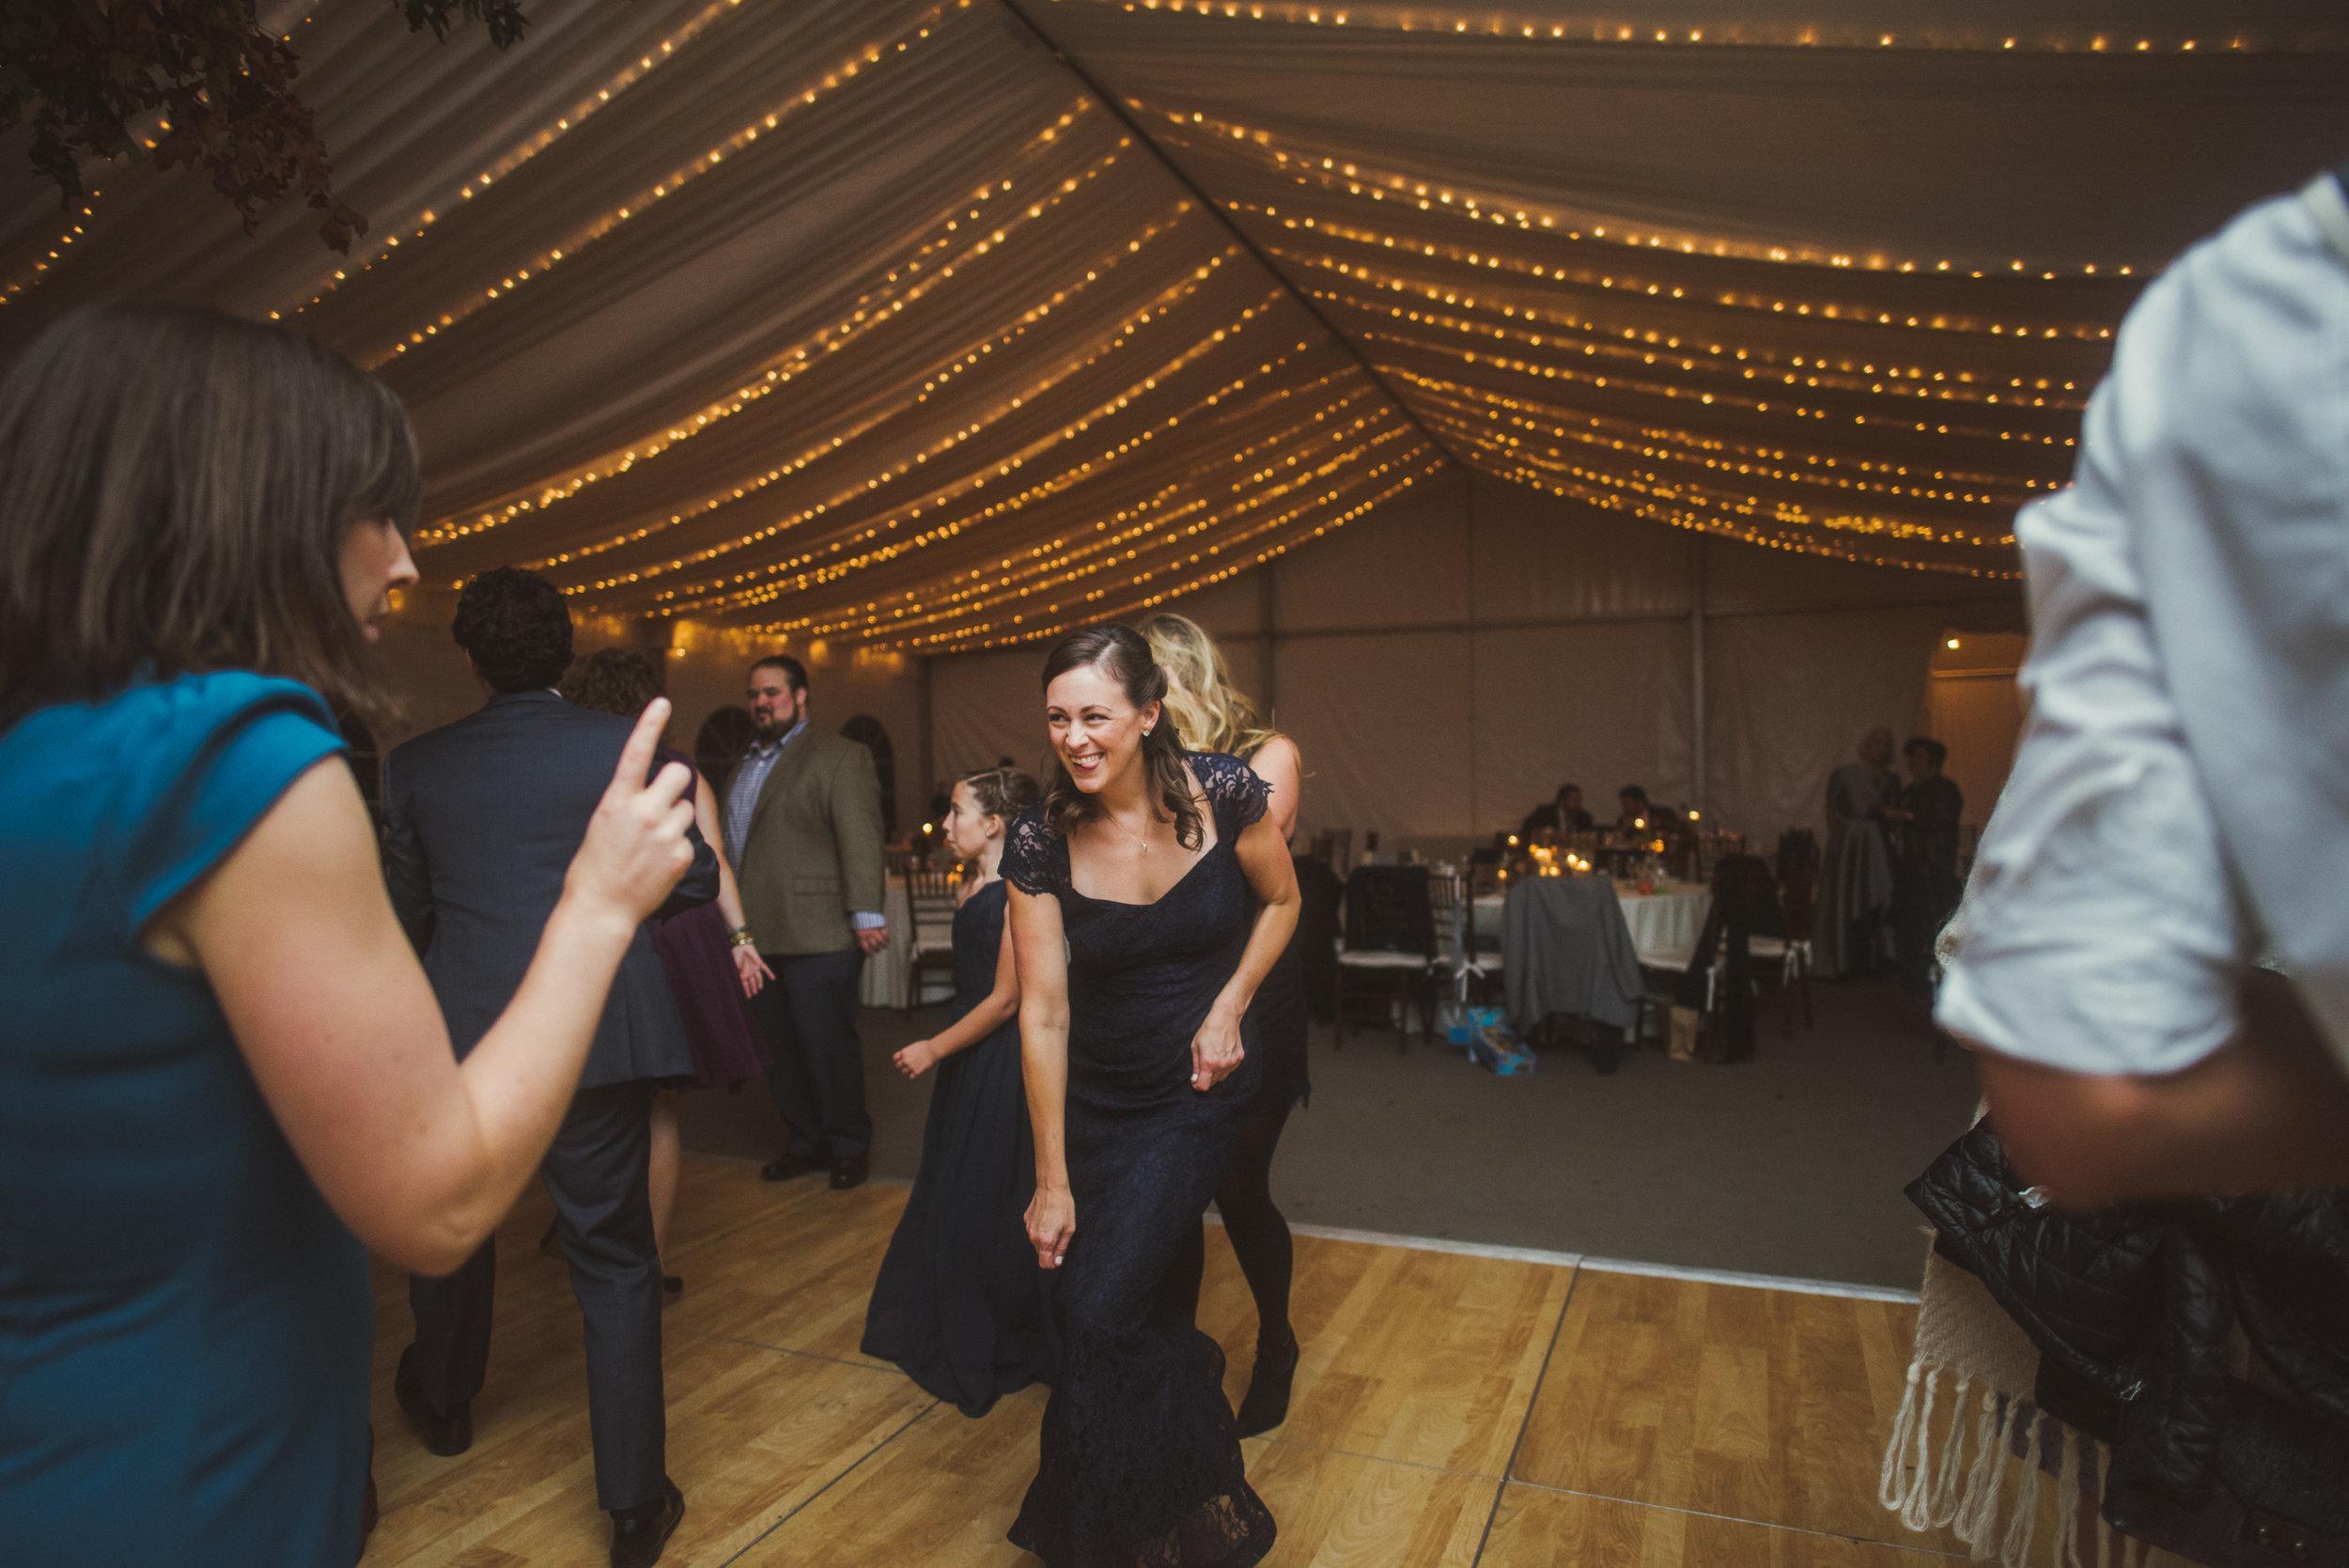 JACQUELINE & ANDREW WARSHAWER -BROOKMILL FARM FALL WEDDING - INTIMATE WEDDING PHOTOGRAPHER - TWOTWENTY by CHI-CHI AGBIM-767.jpg